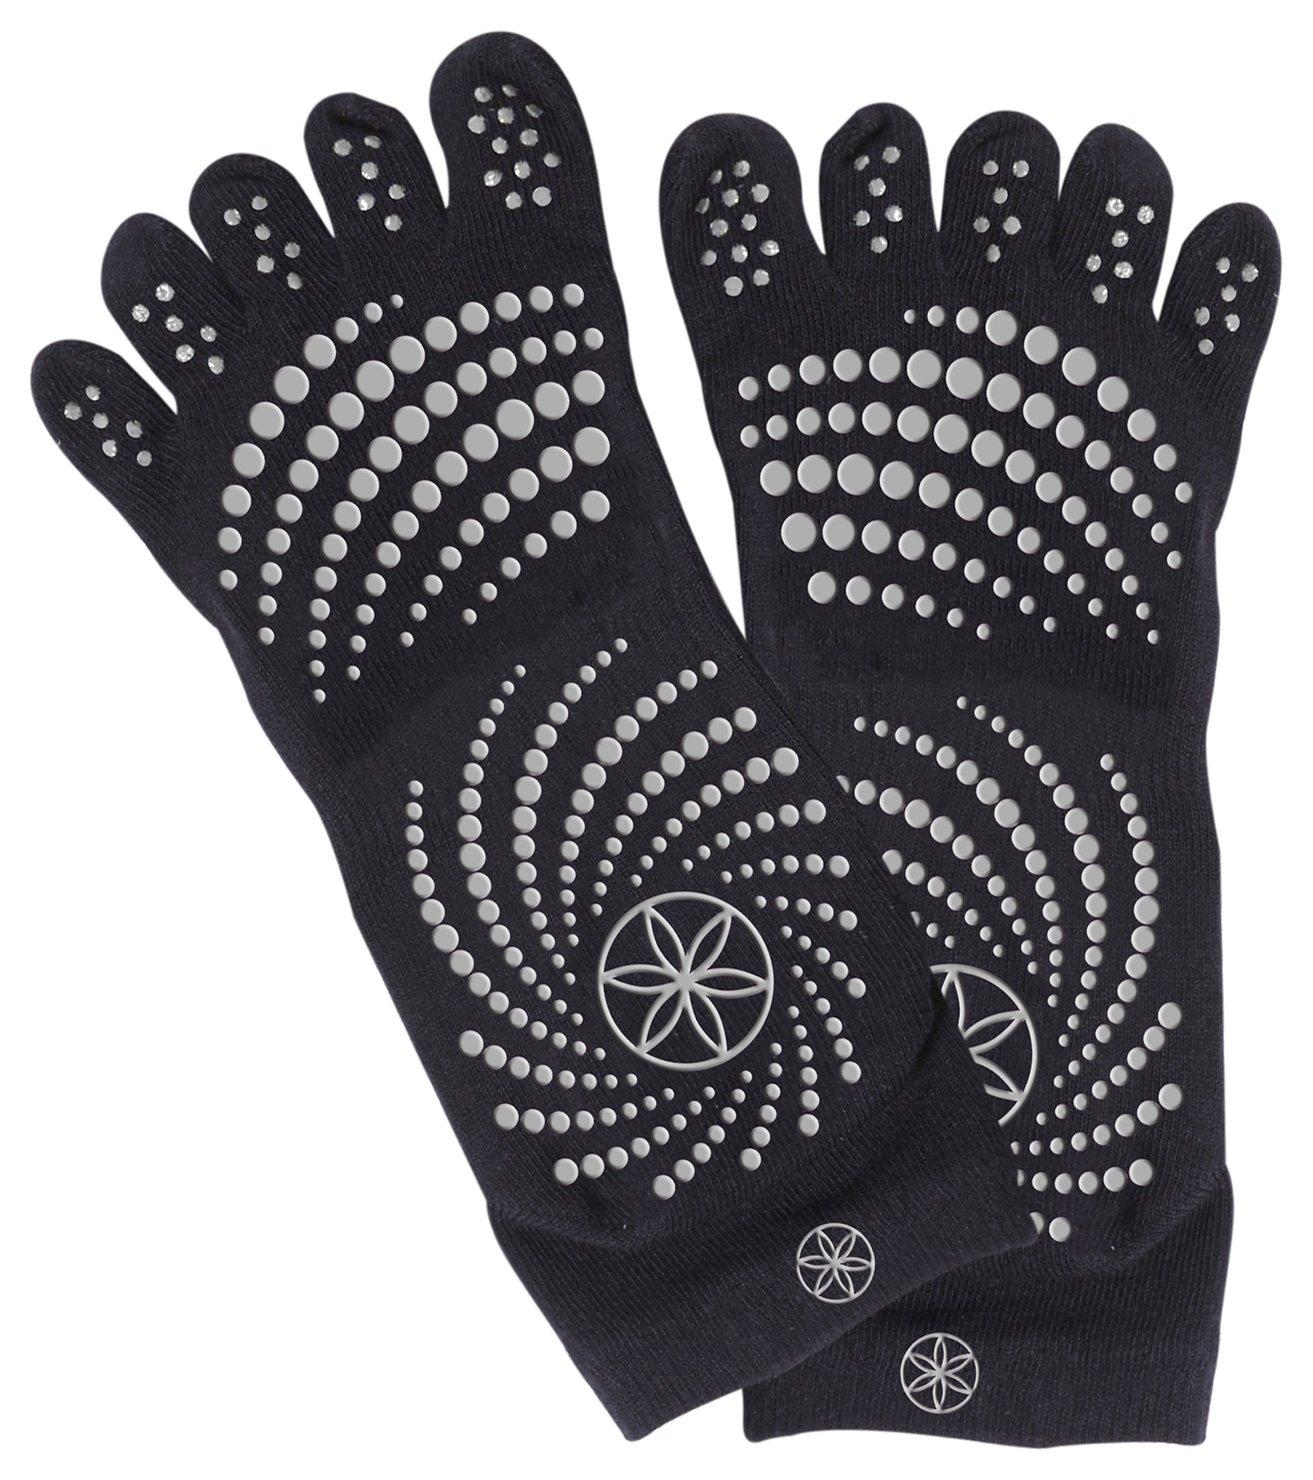 Gaiam - Medium to Large All Grip Yoga Socks Review